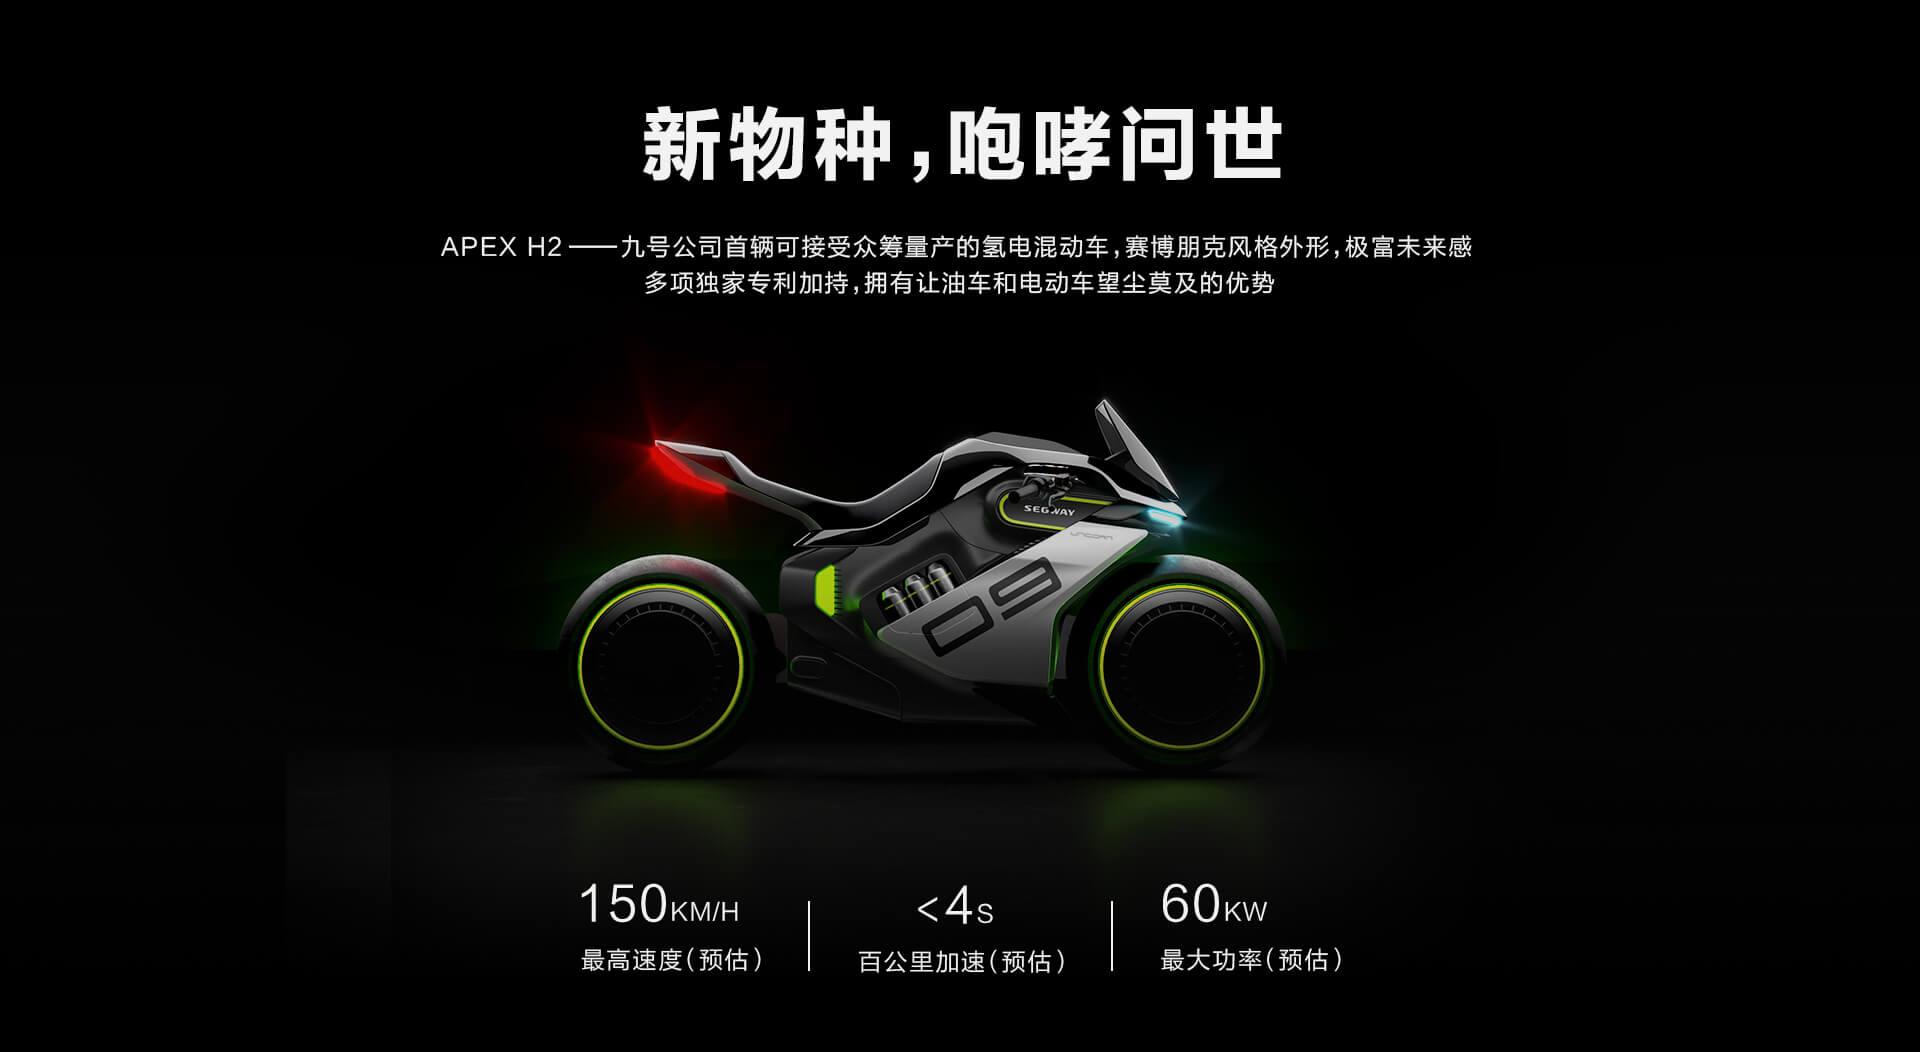 Segway Apex H2 hydrogen bike